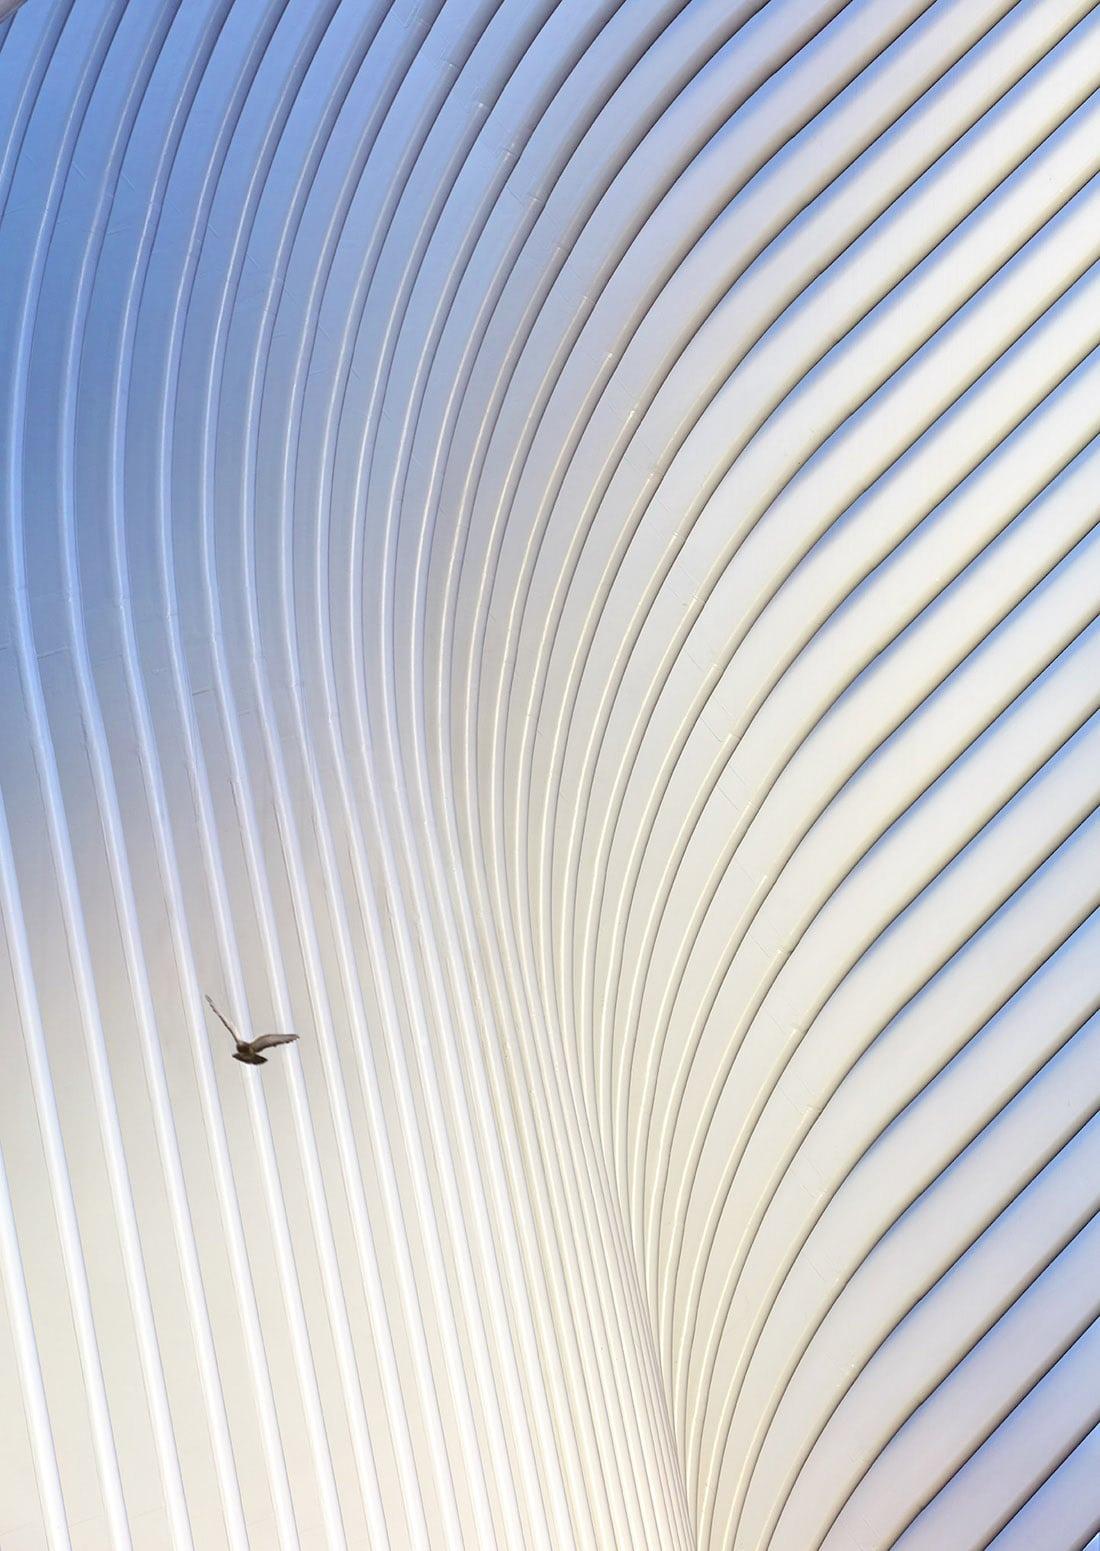 Santiago Calatrava Oculus